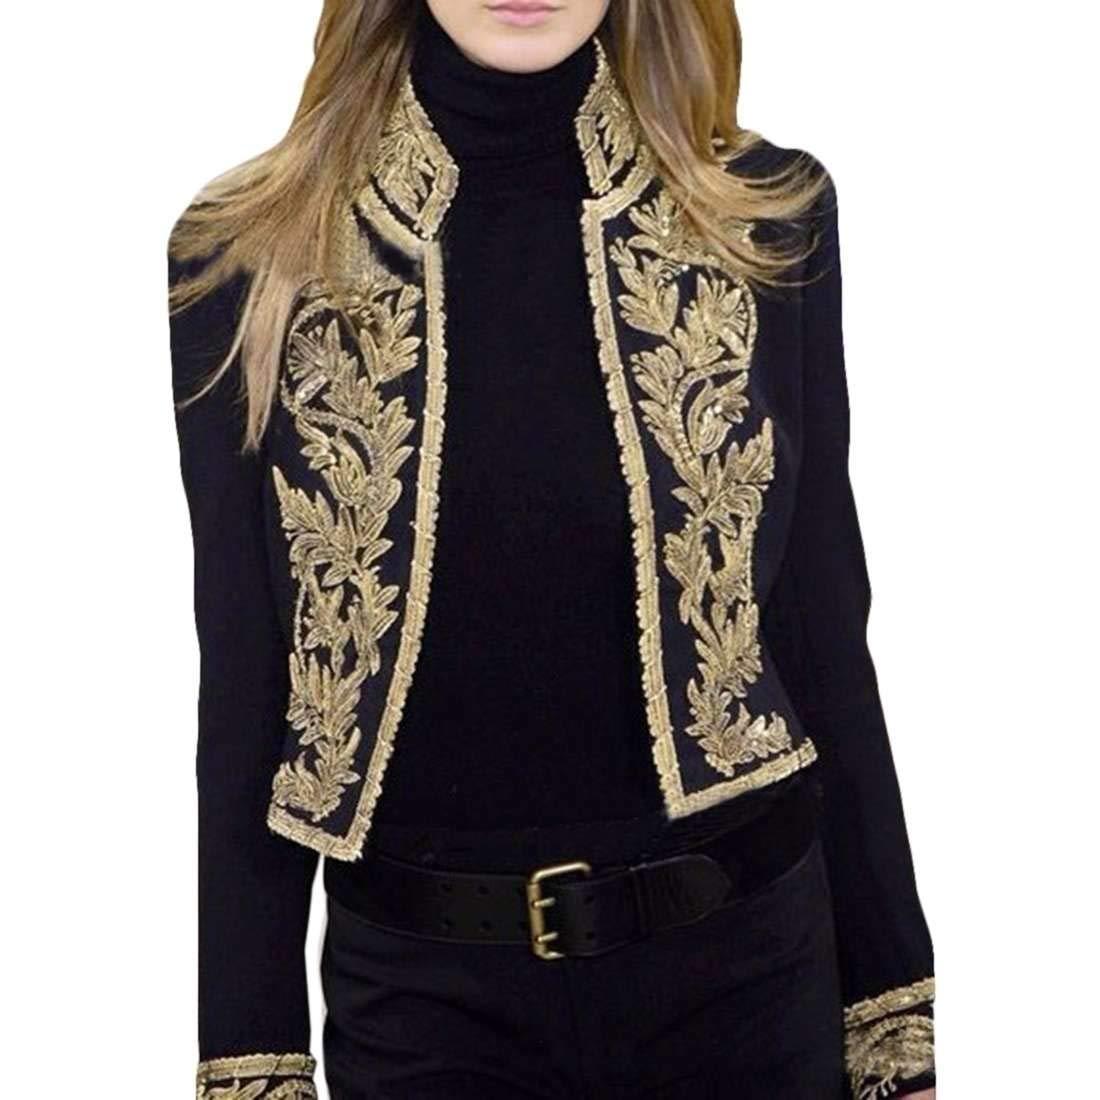 GRMO Women Long Sleeve Slim Fit Stand Collar Open Front Print Blazer Jacket